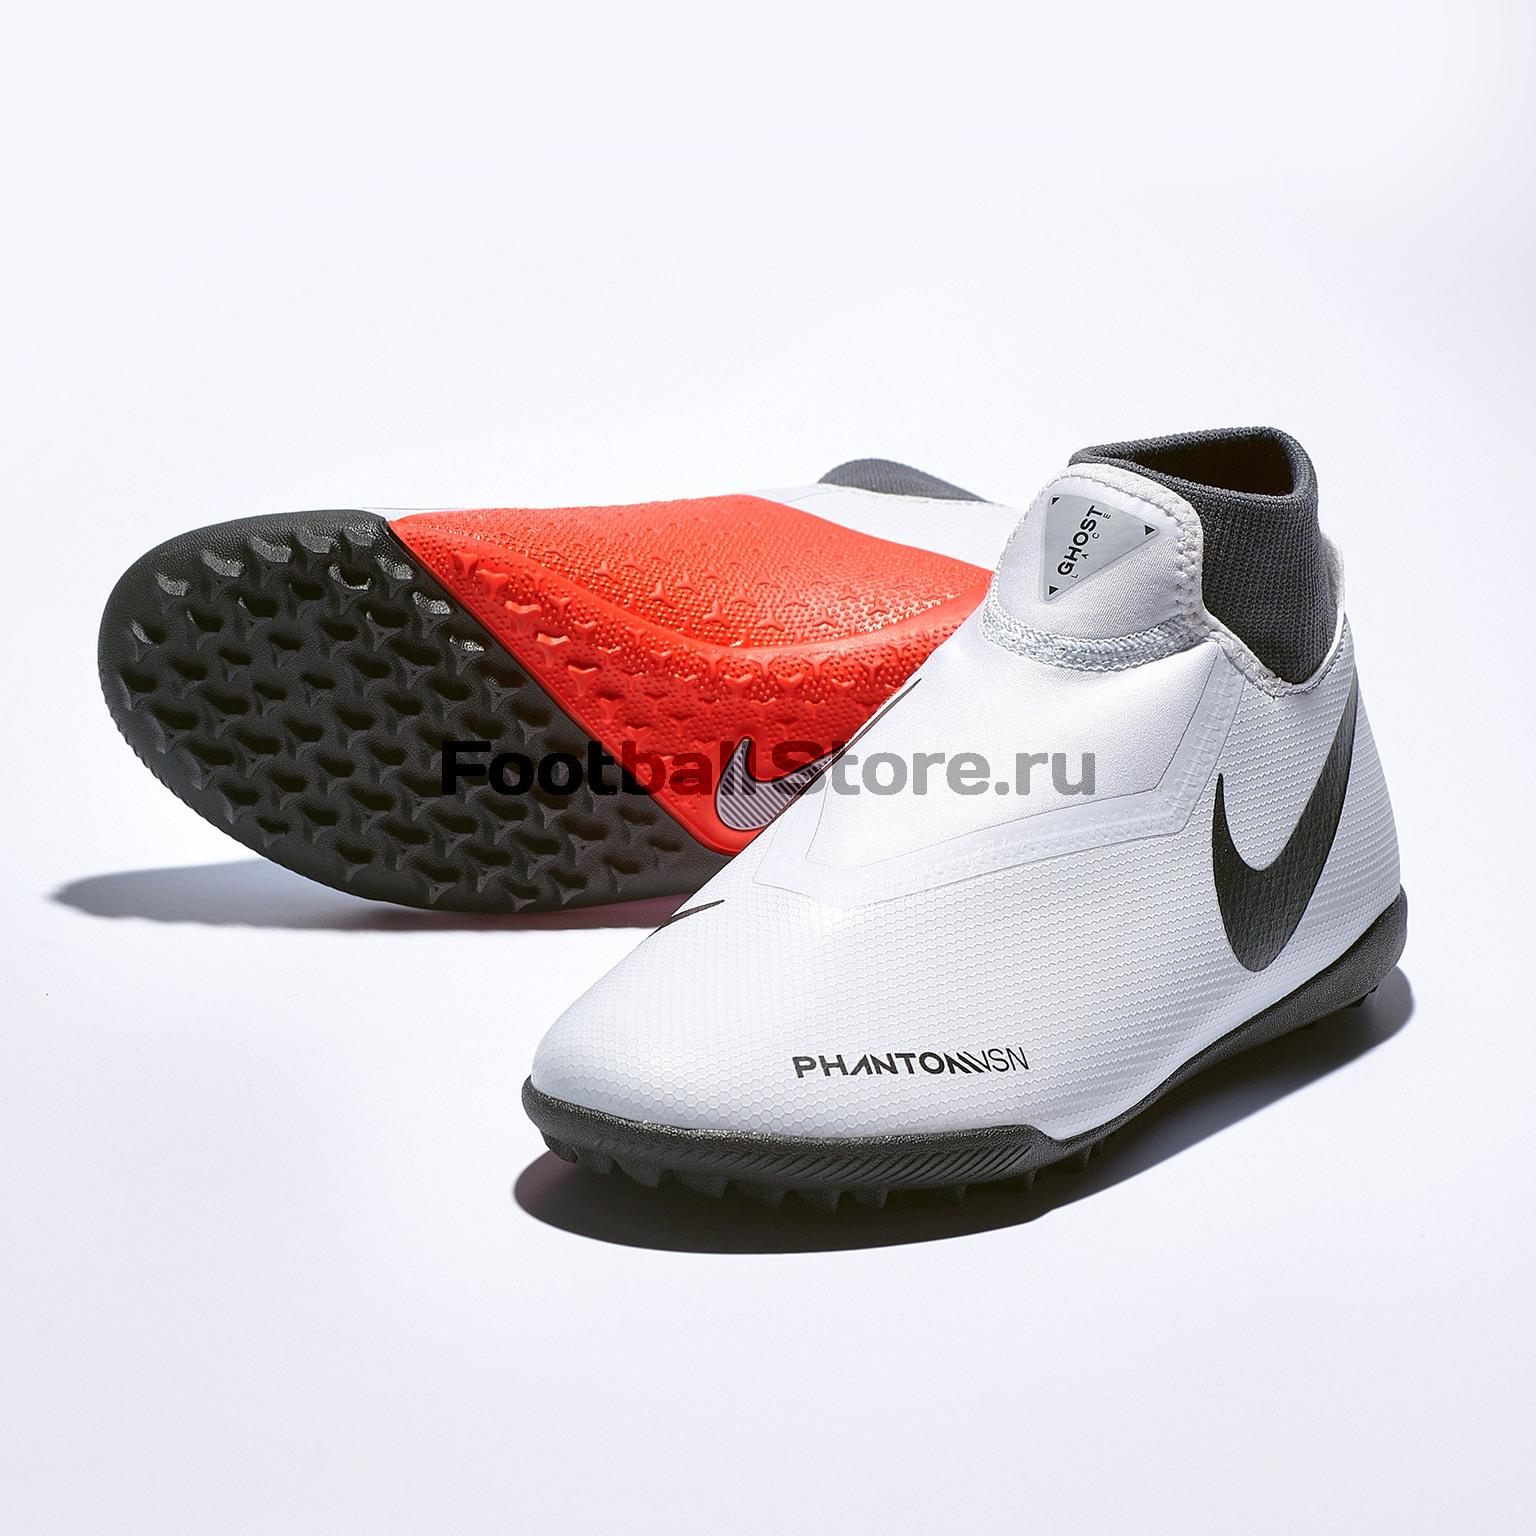 Шиповки Nike Phantom X 3 Academy DF TF AO3269-060 шиповки nike mercurialx victory vi df tf 903614 001